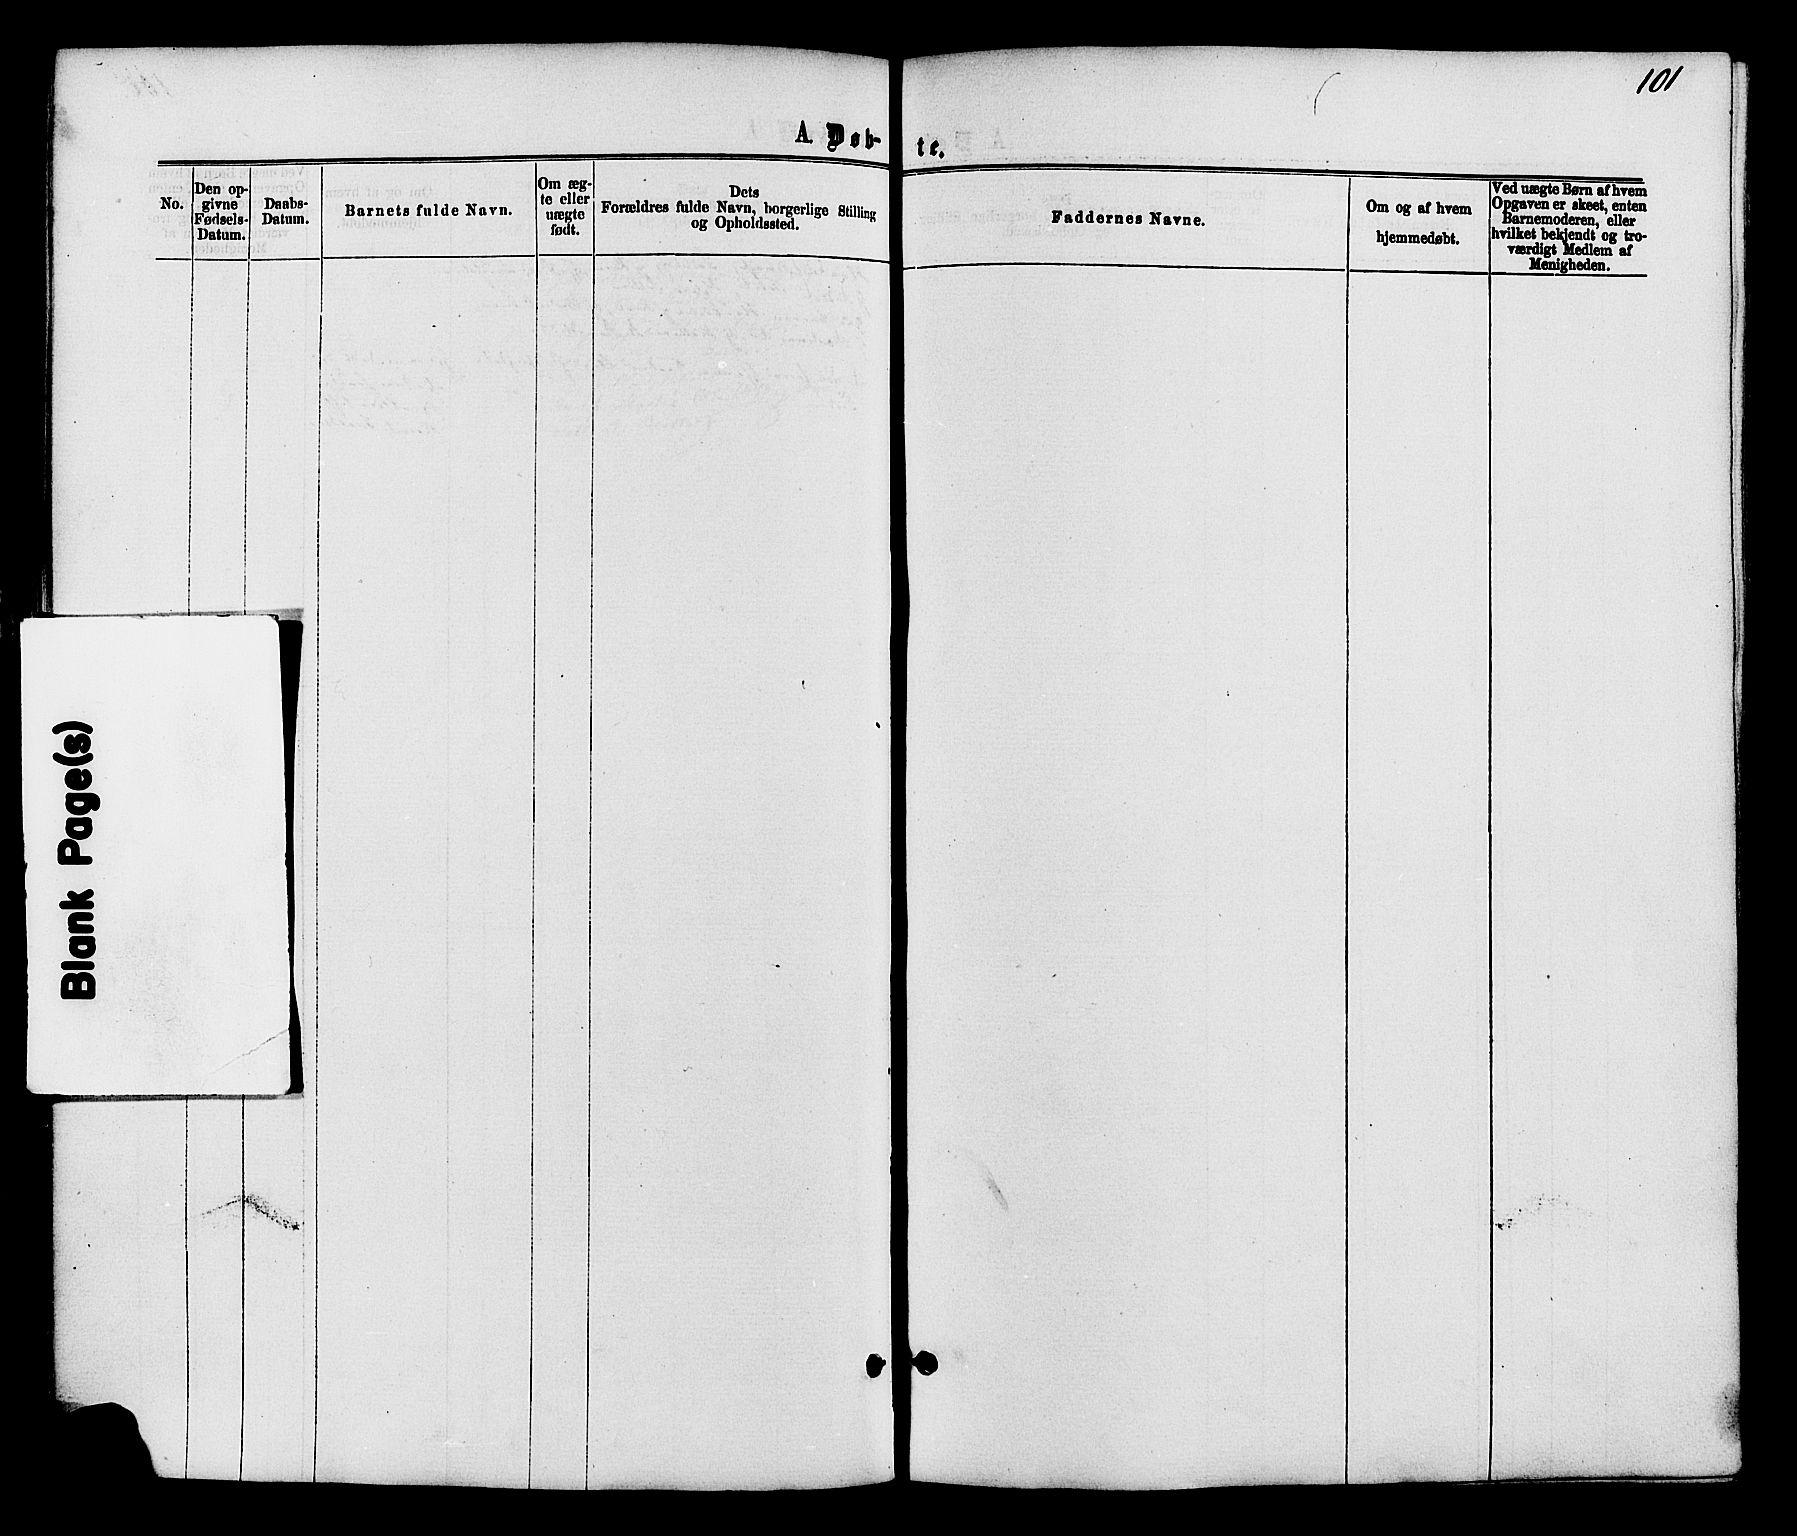 SAH, Nordre Land prestekontor, Ministerialbok nr. 2, 1872-1881, s. 101